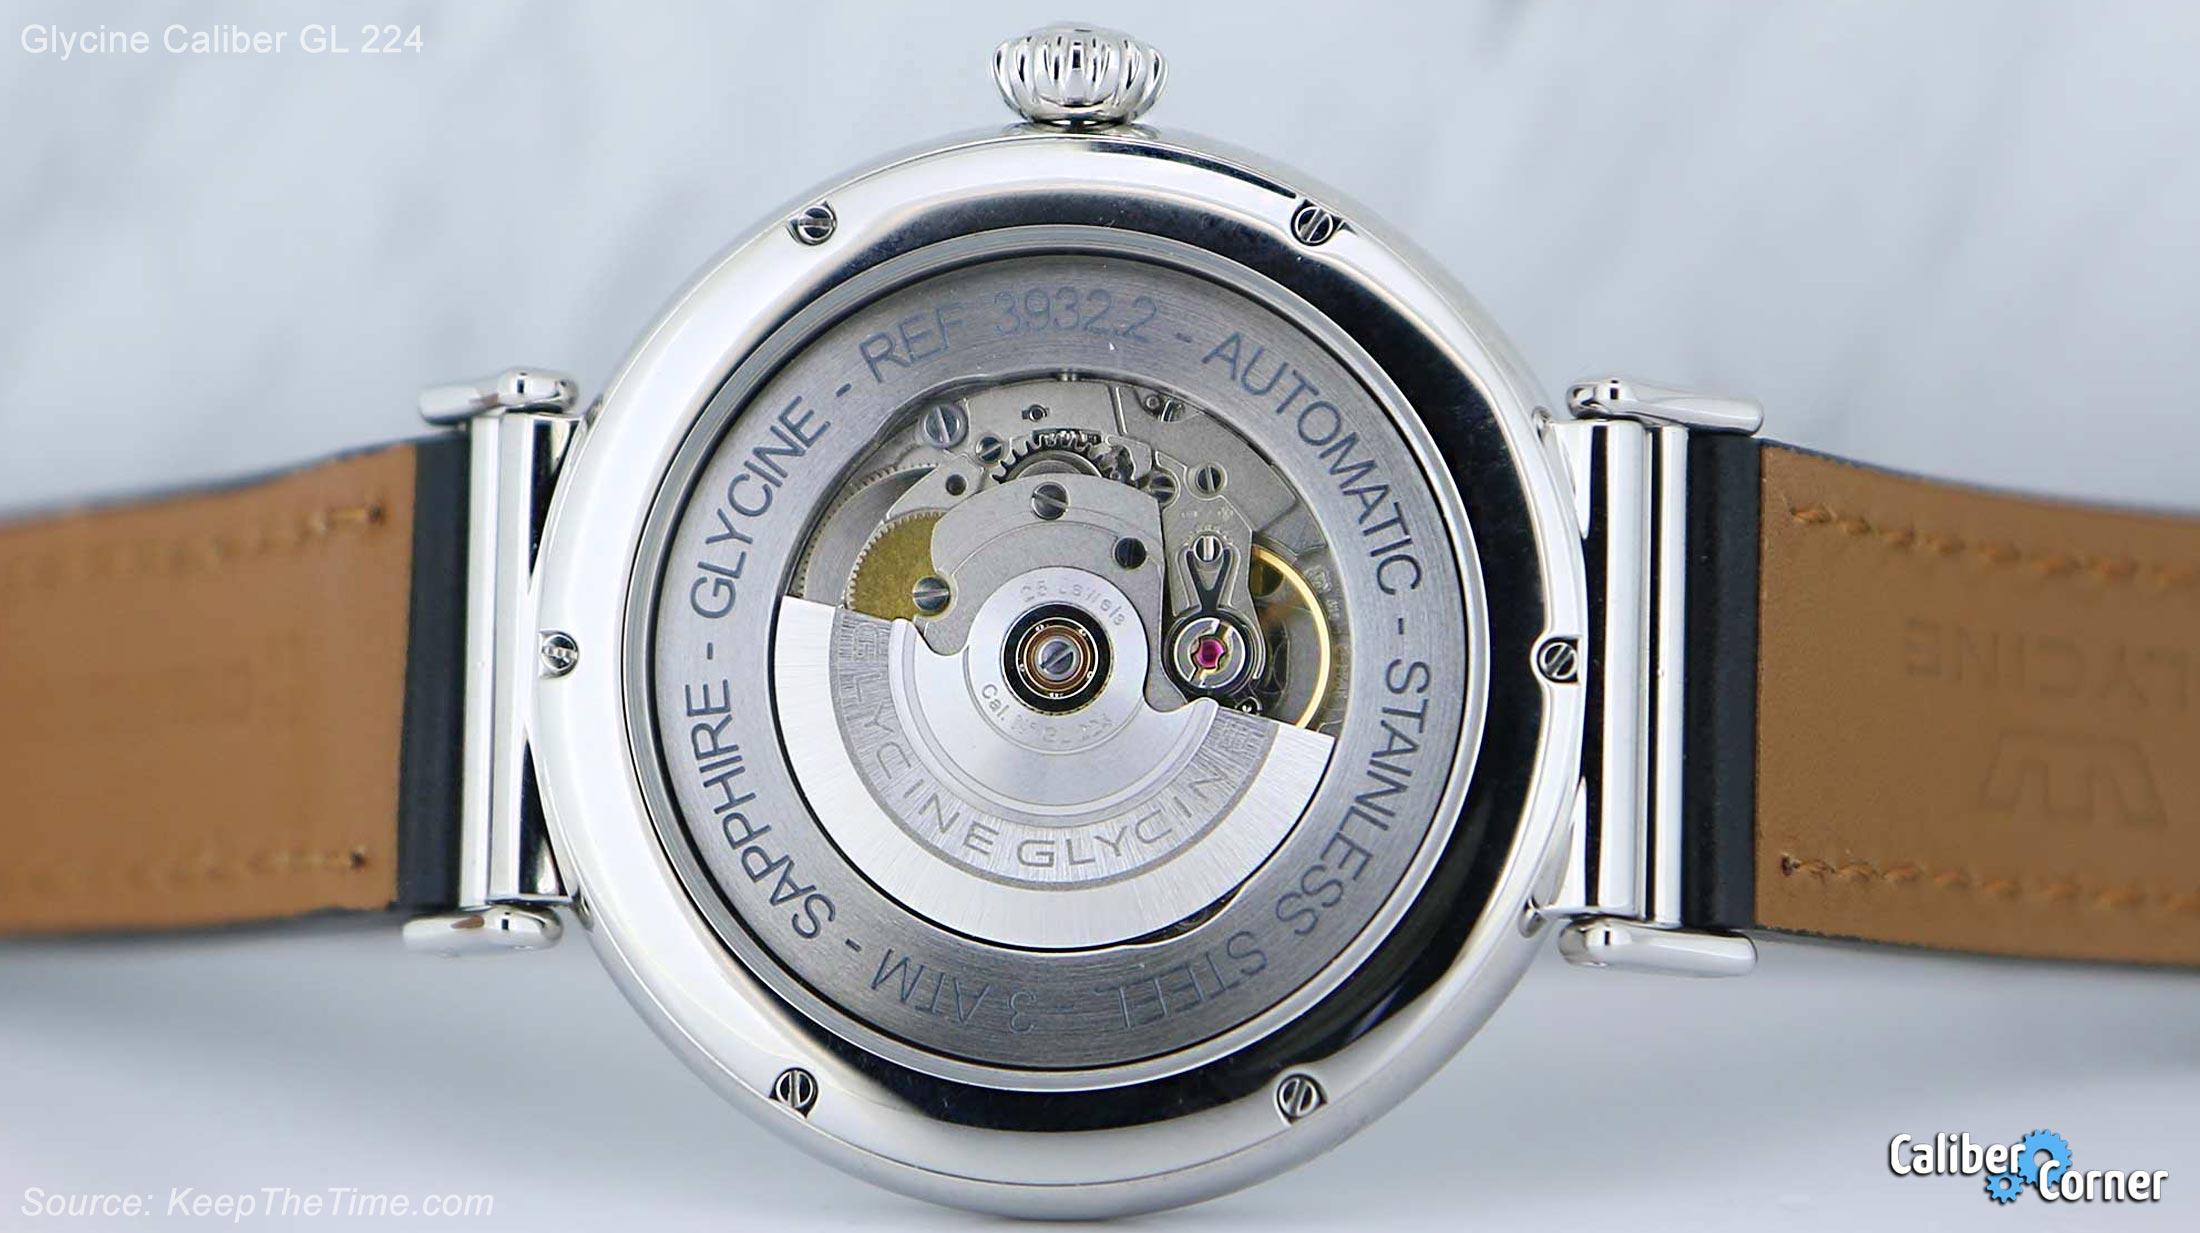 Glycine Caliber Gl224 F 104 Watch